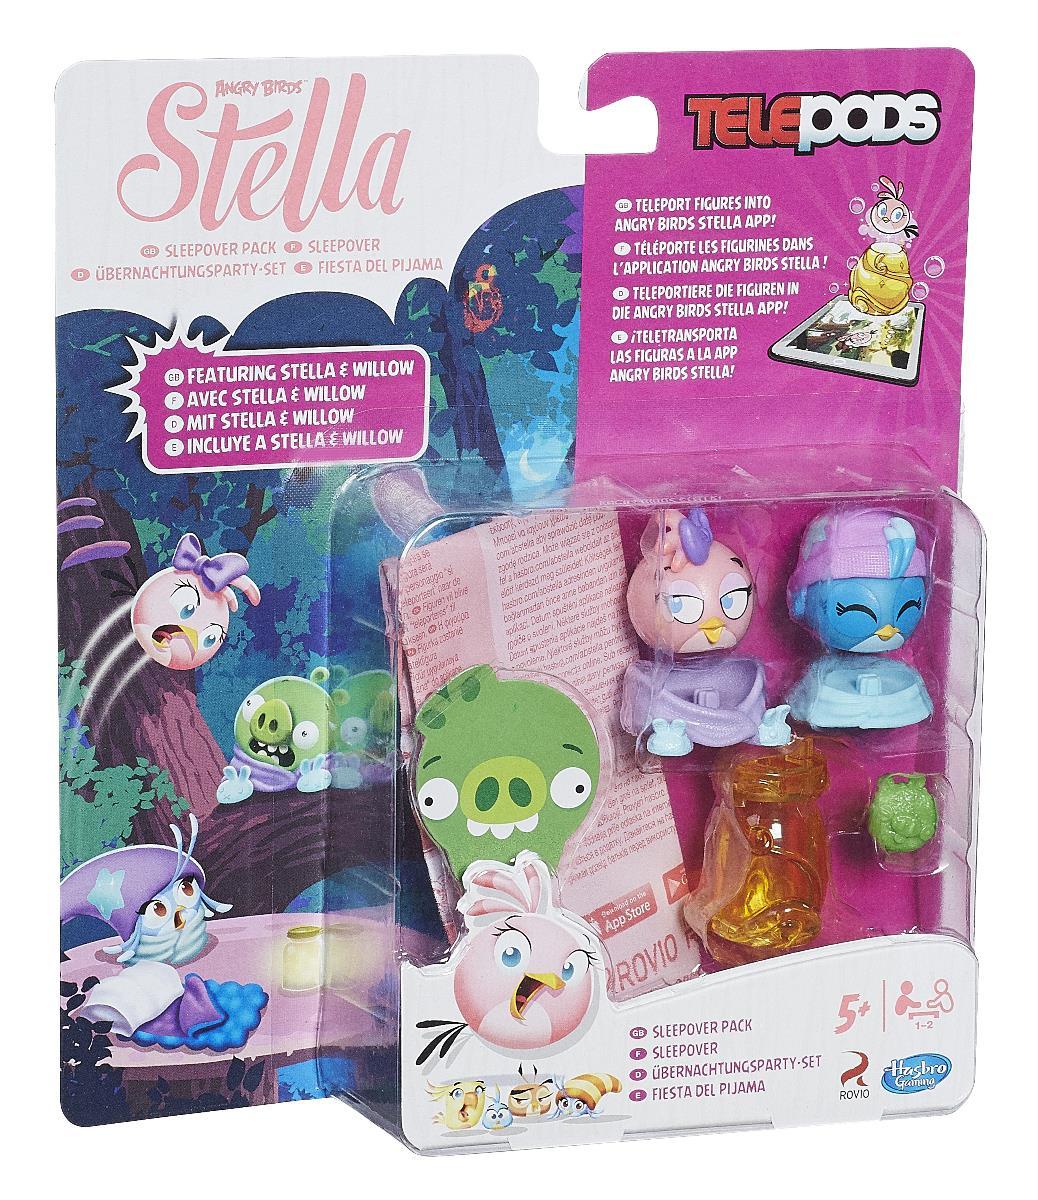 Angry Birds Stella Mutipack - Sleepover Pack